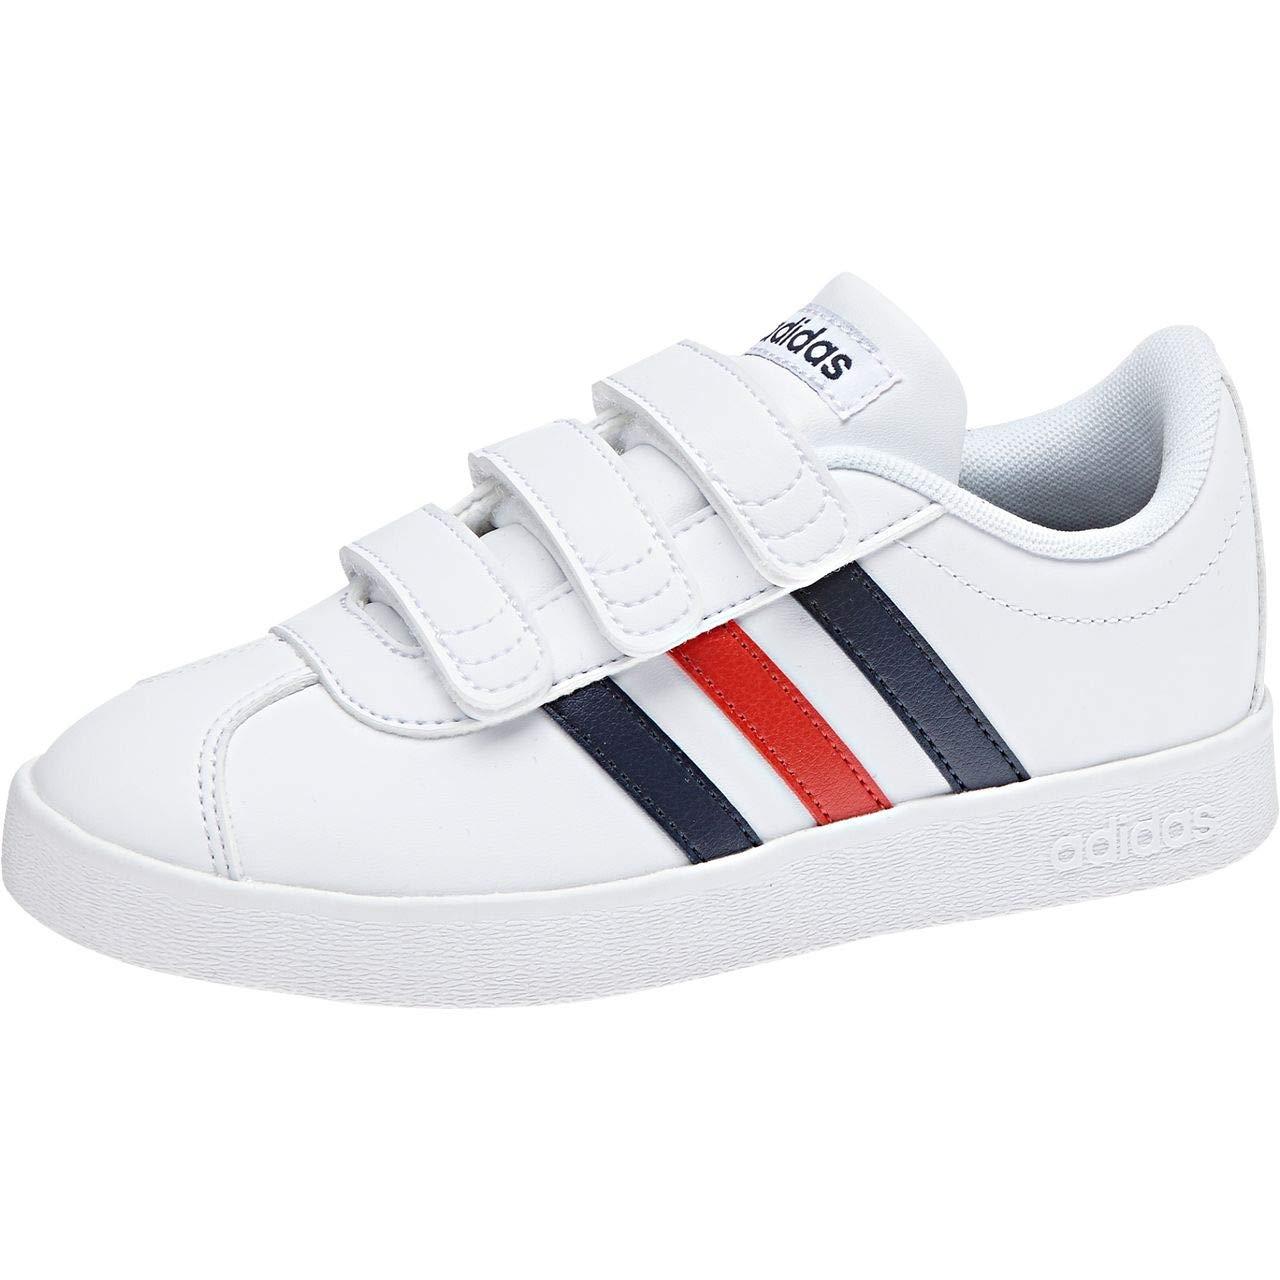 Adidas VL Court 2.0 CMF C, Chaussures de Fitness Mixte Enfant, Blanc Blanc (Ftwbla/Maruni/Rojbas 000) 31 EU DB1838